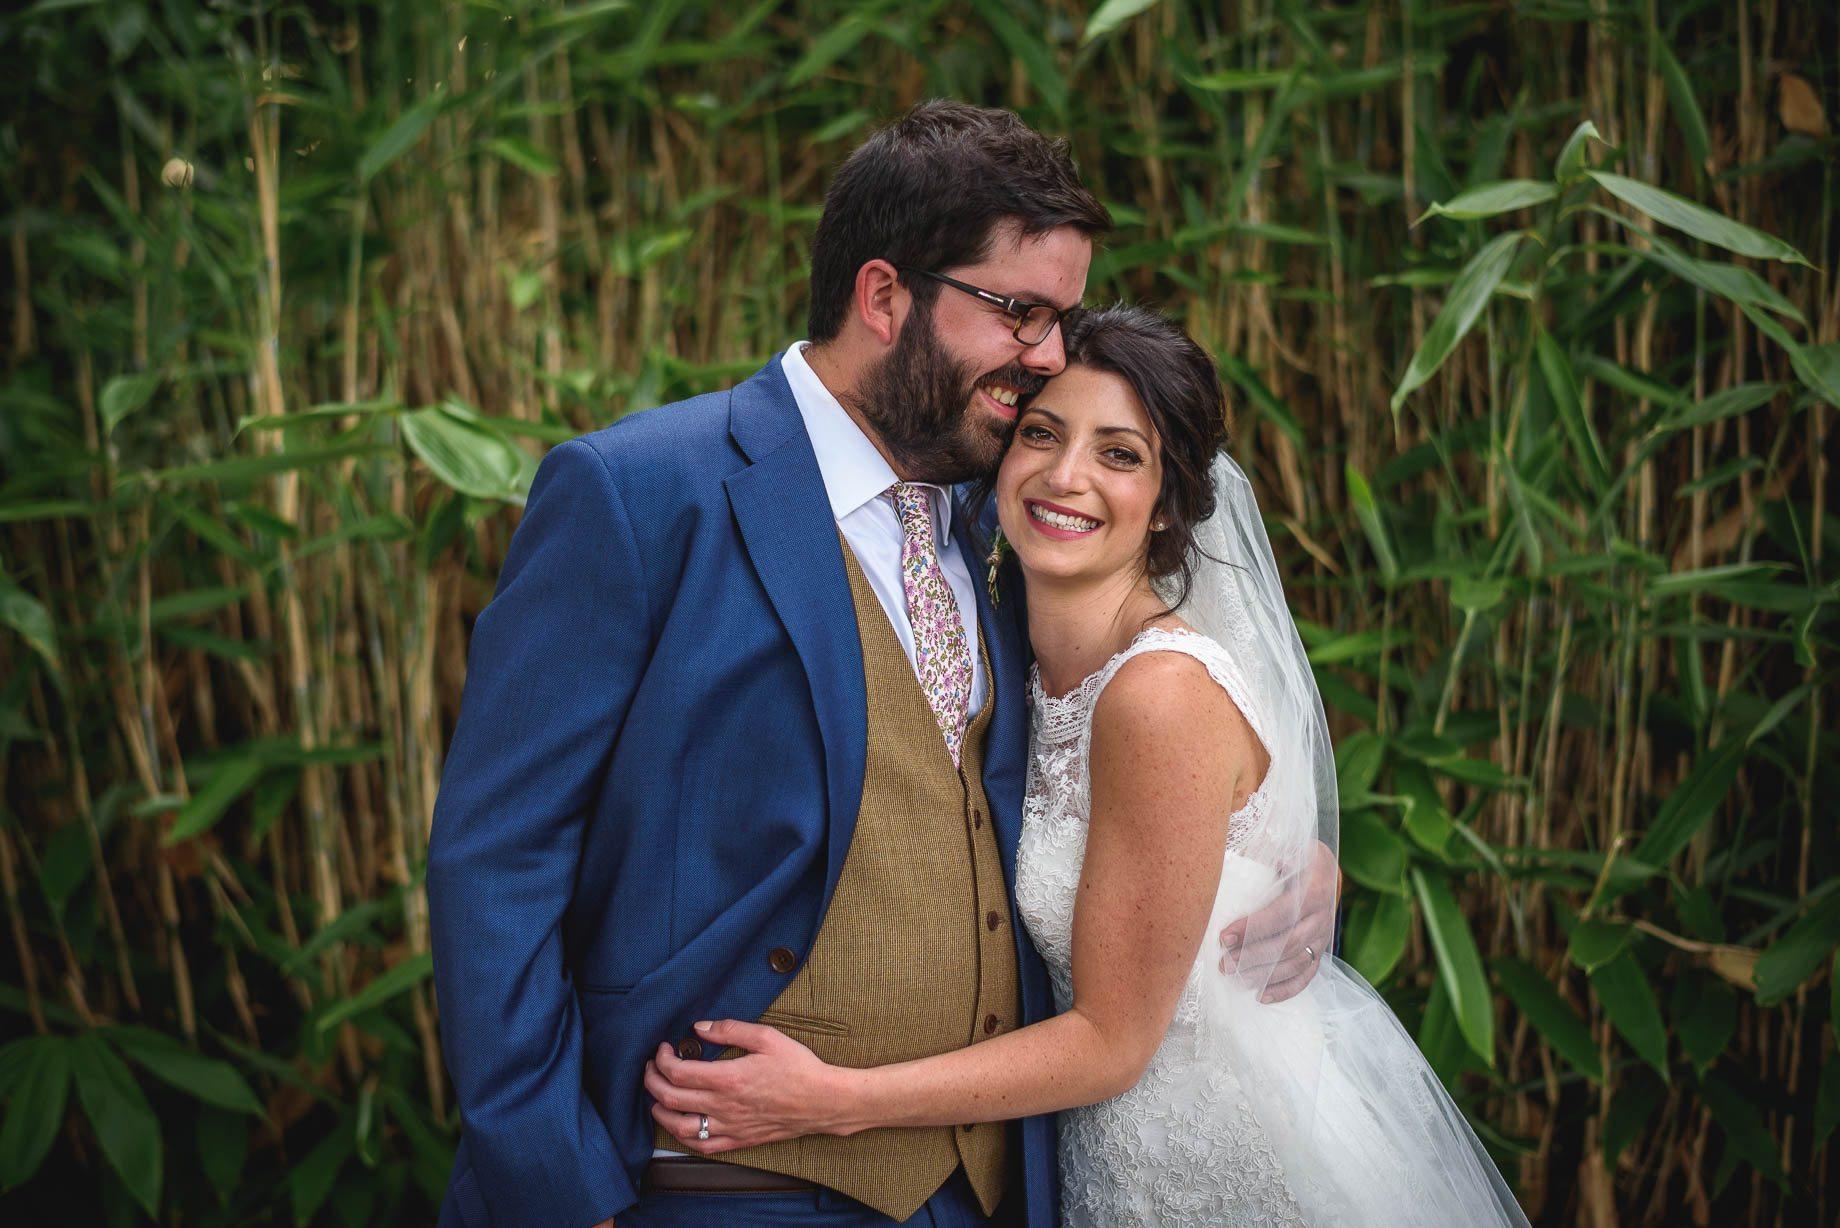 Gaynes Park wedding photography - Guy Collier Photography - Rachel and Jon (146 of 169)